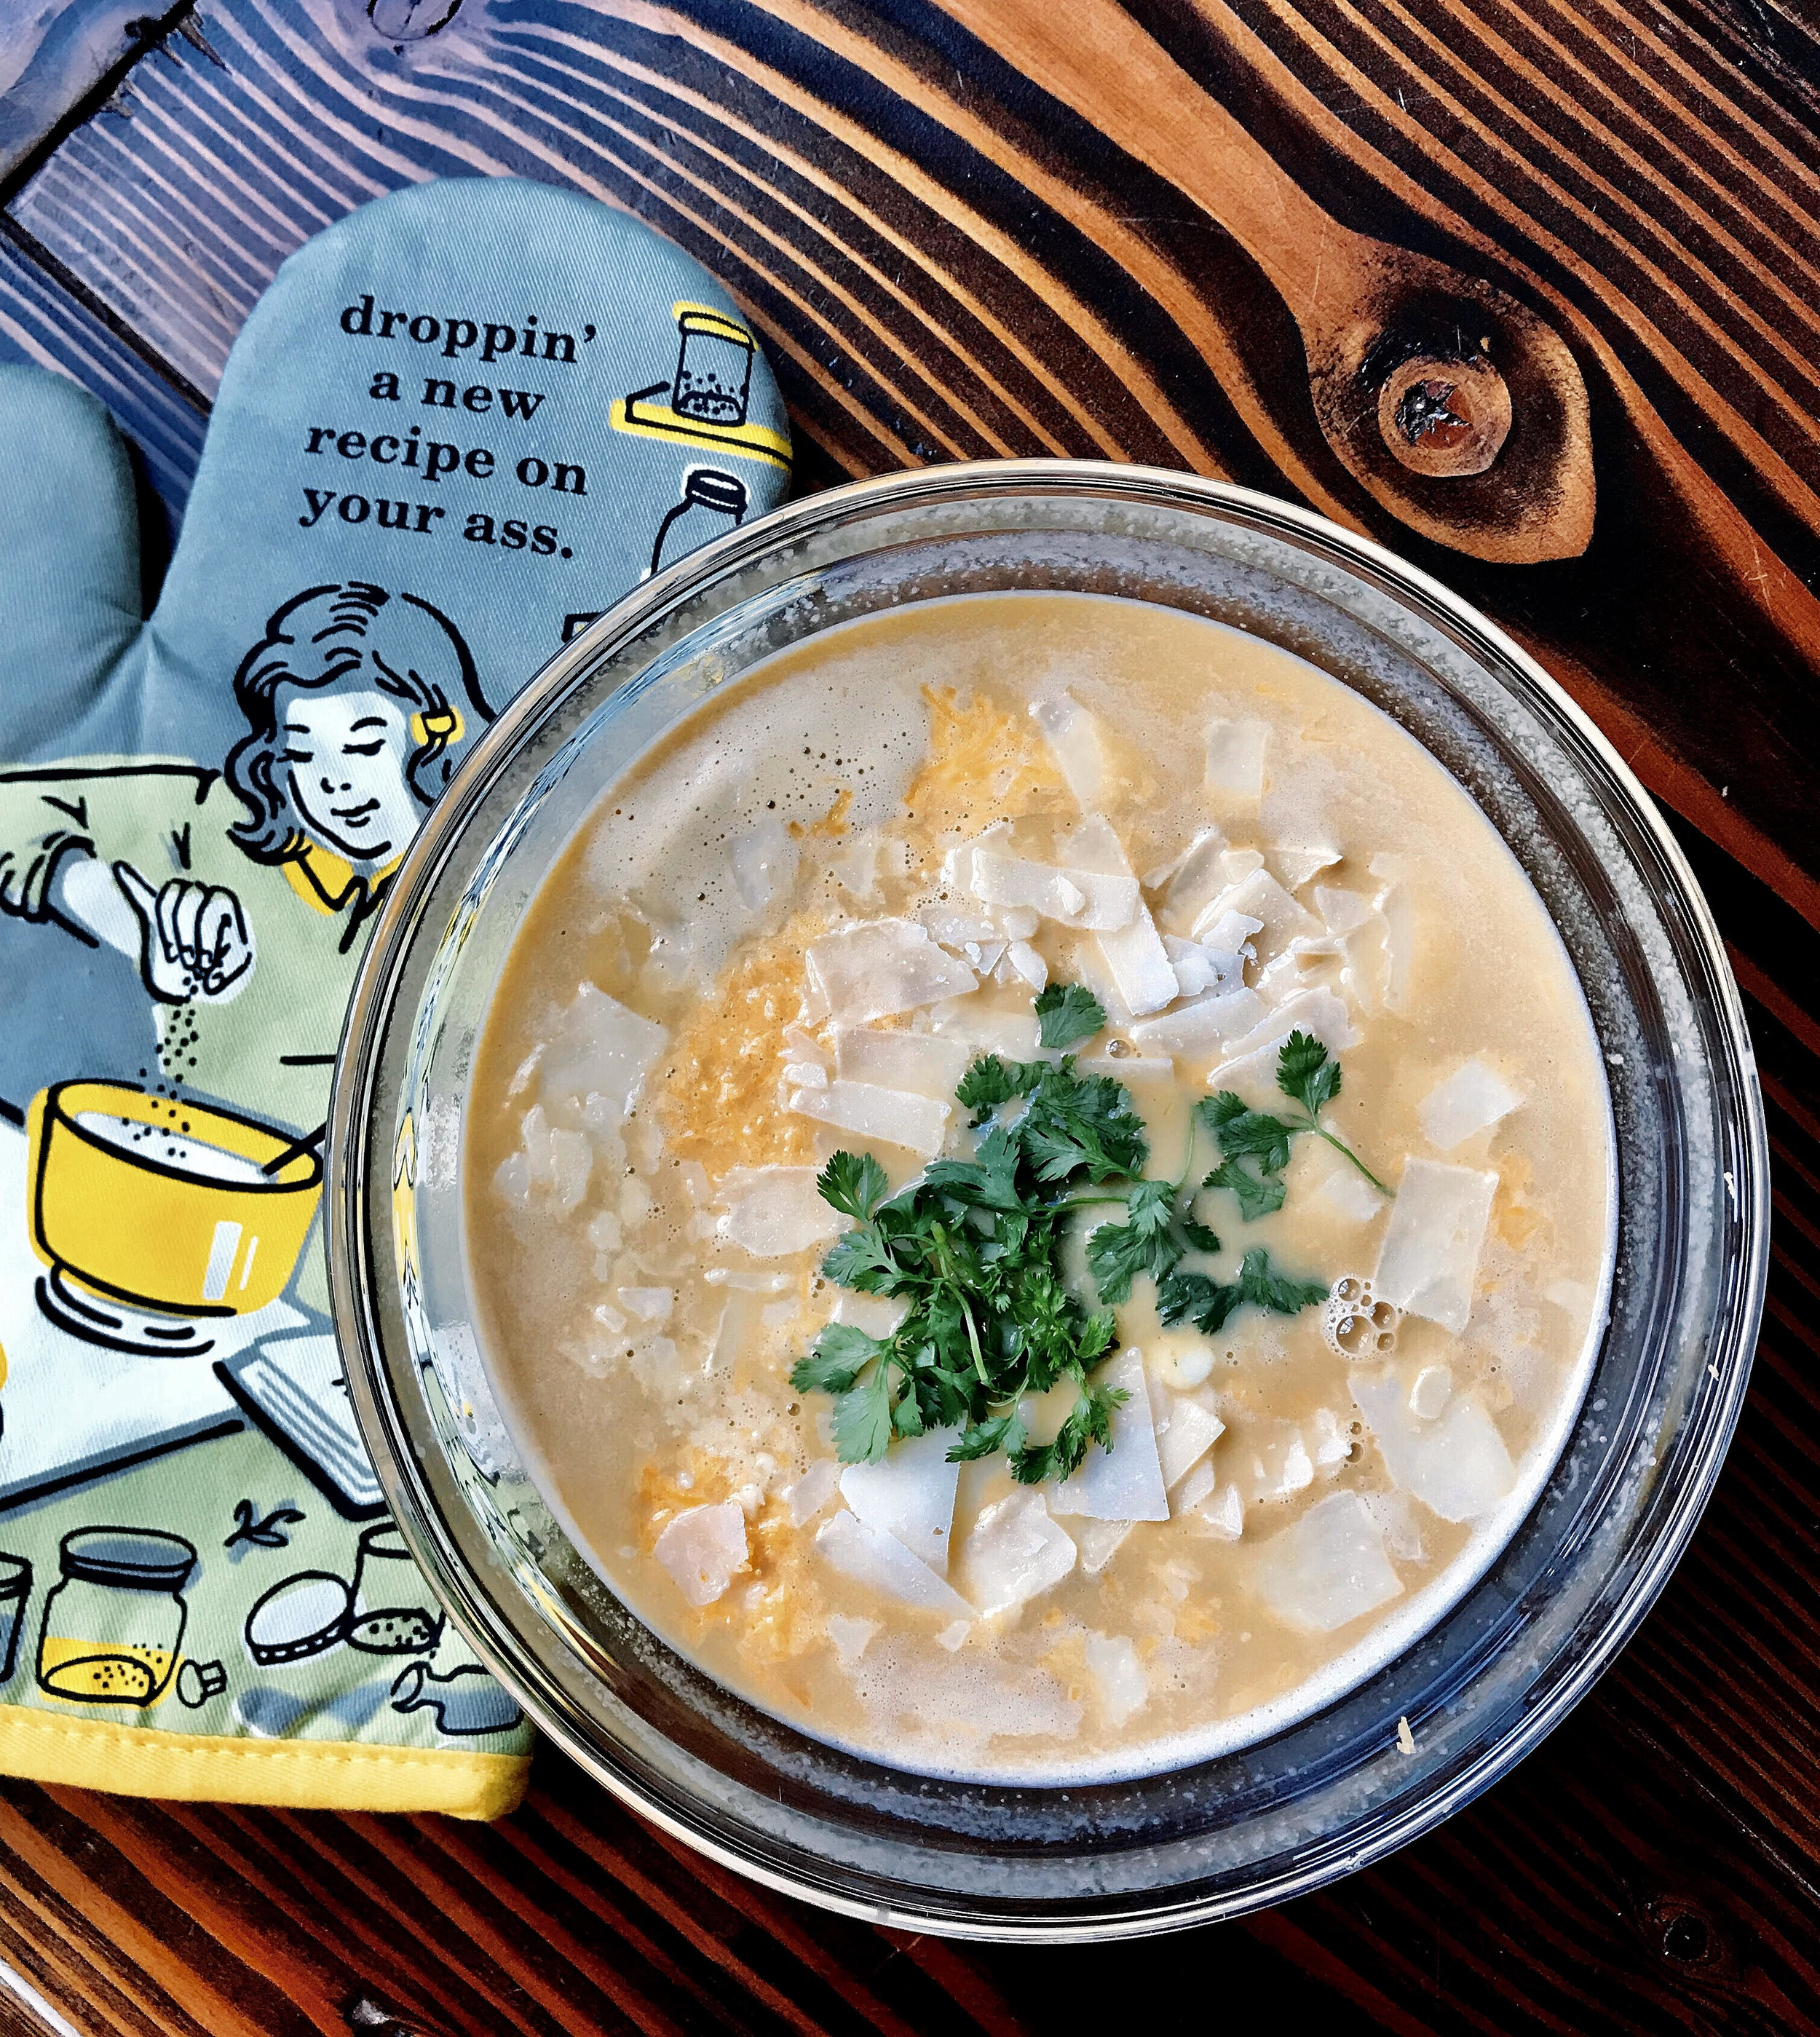 Creamed corn soup